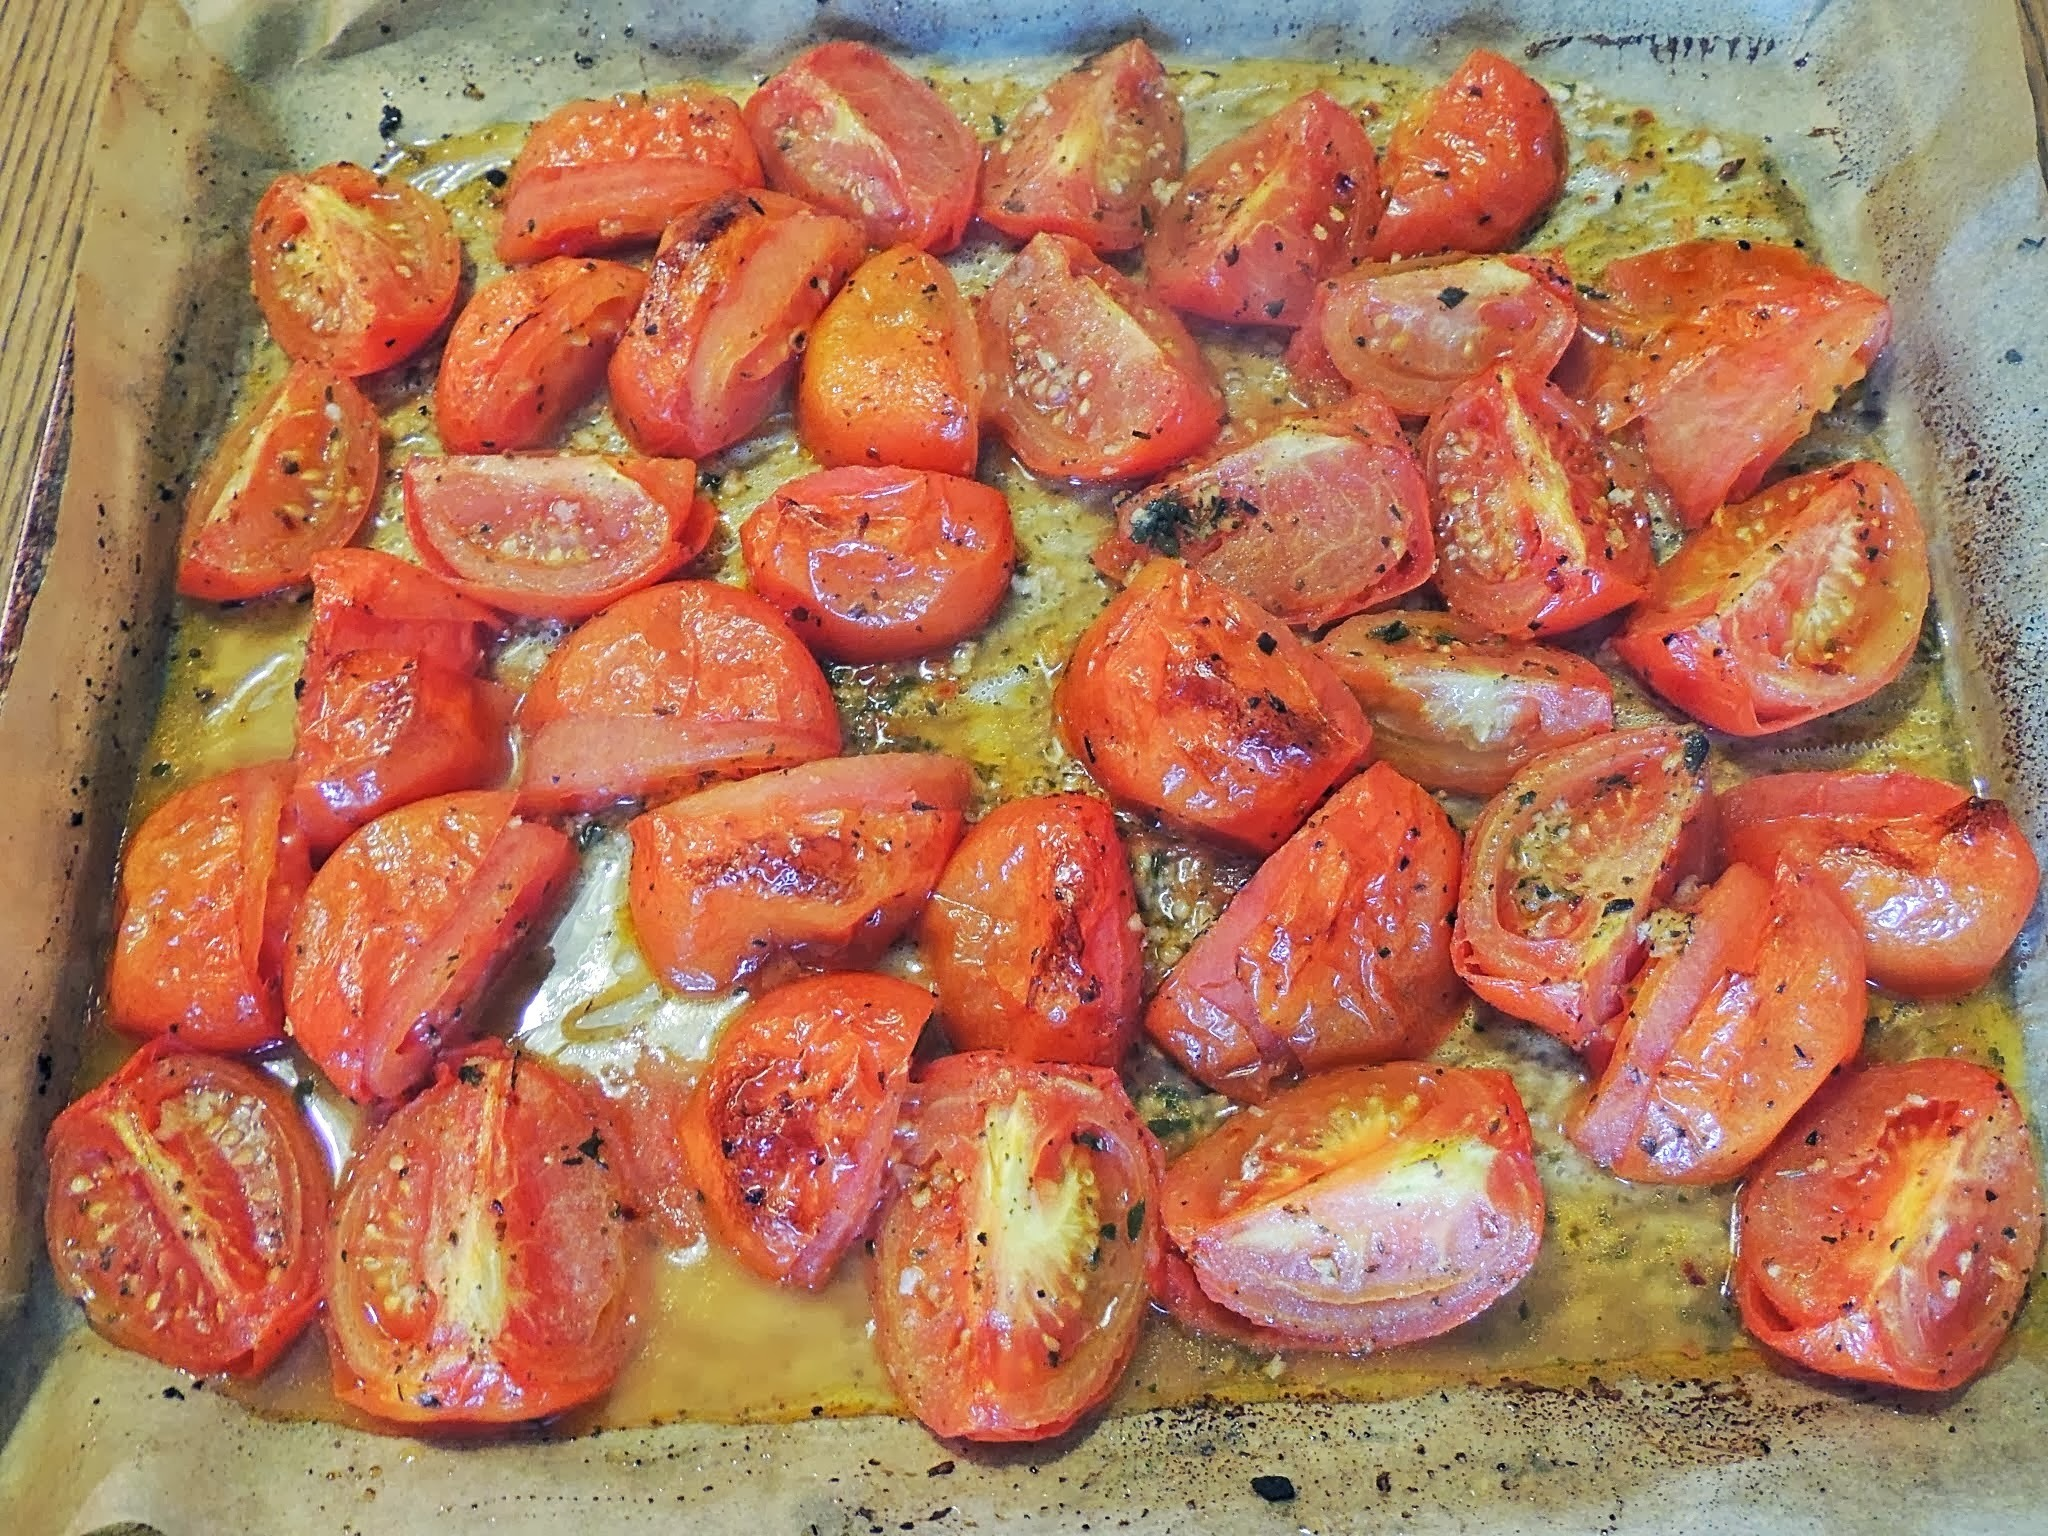 Tomatensuppe jamie oliver rezepte - myTaste